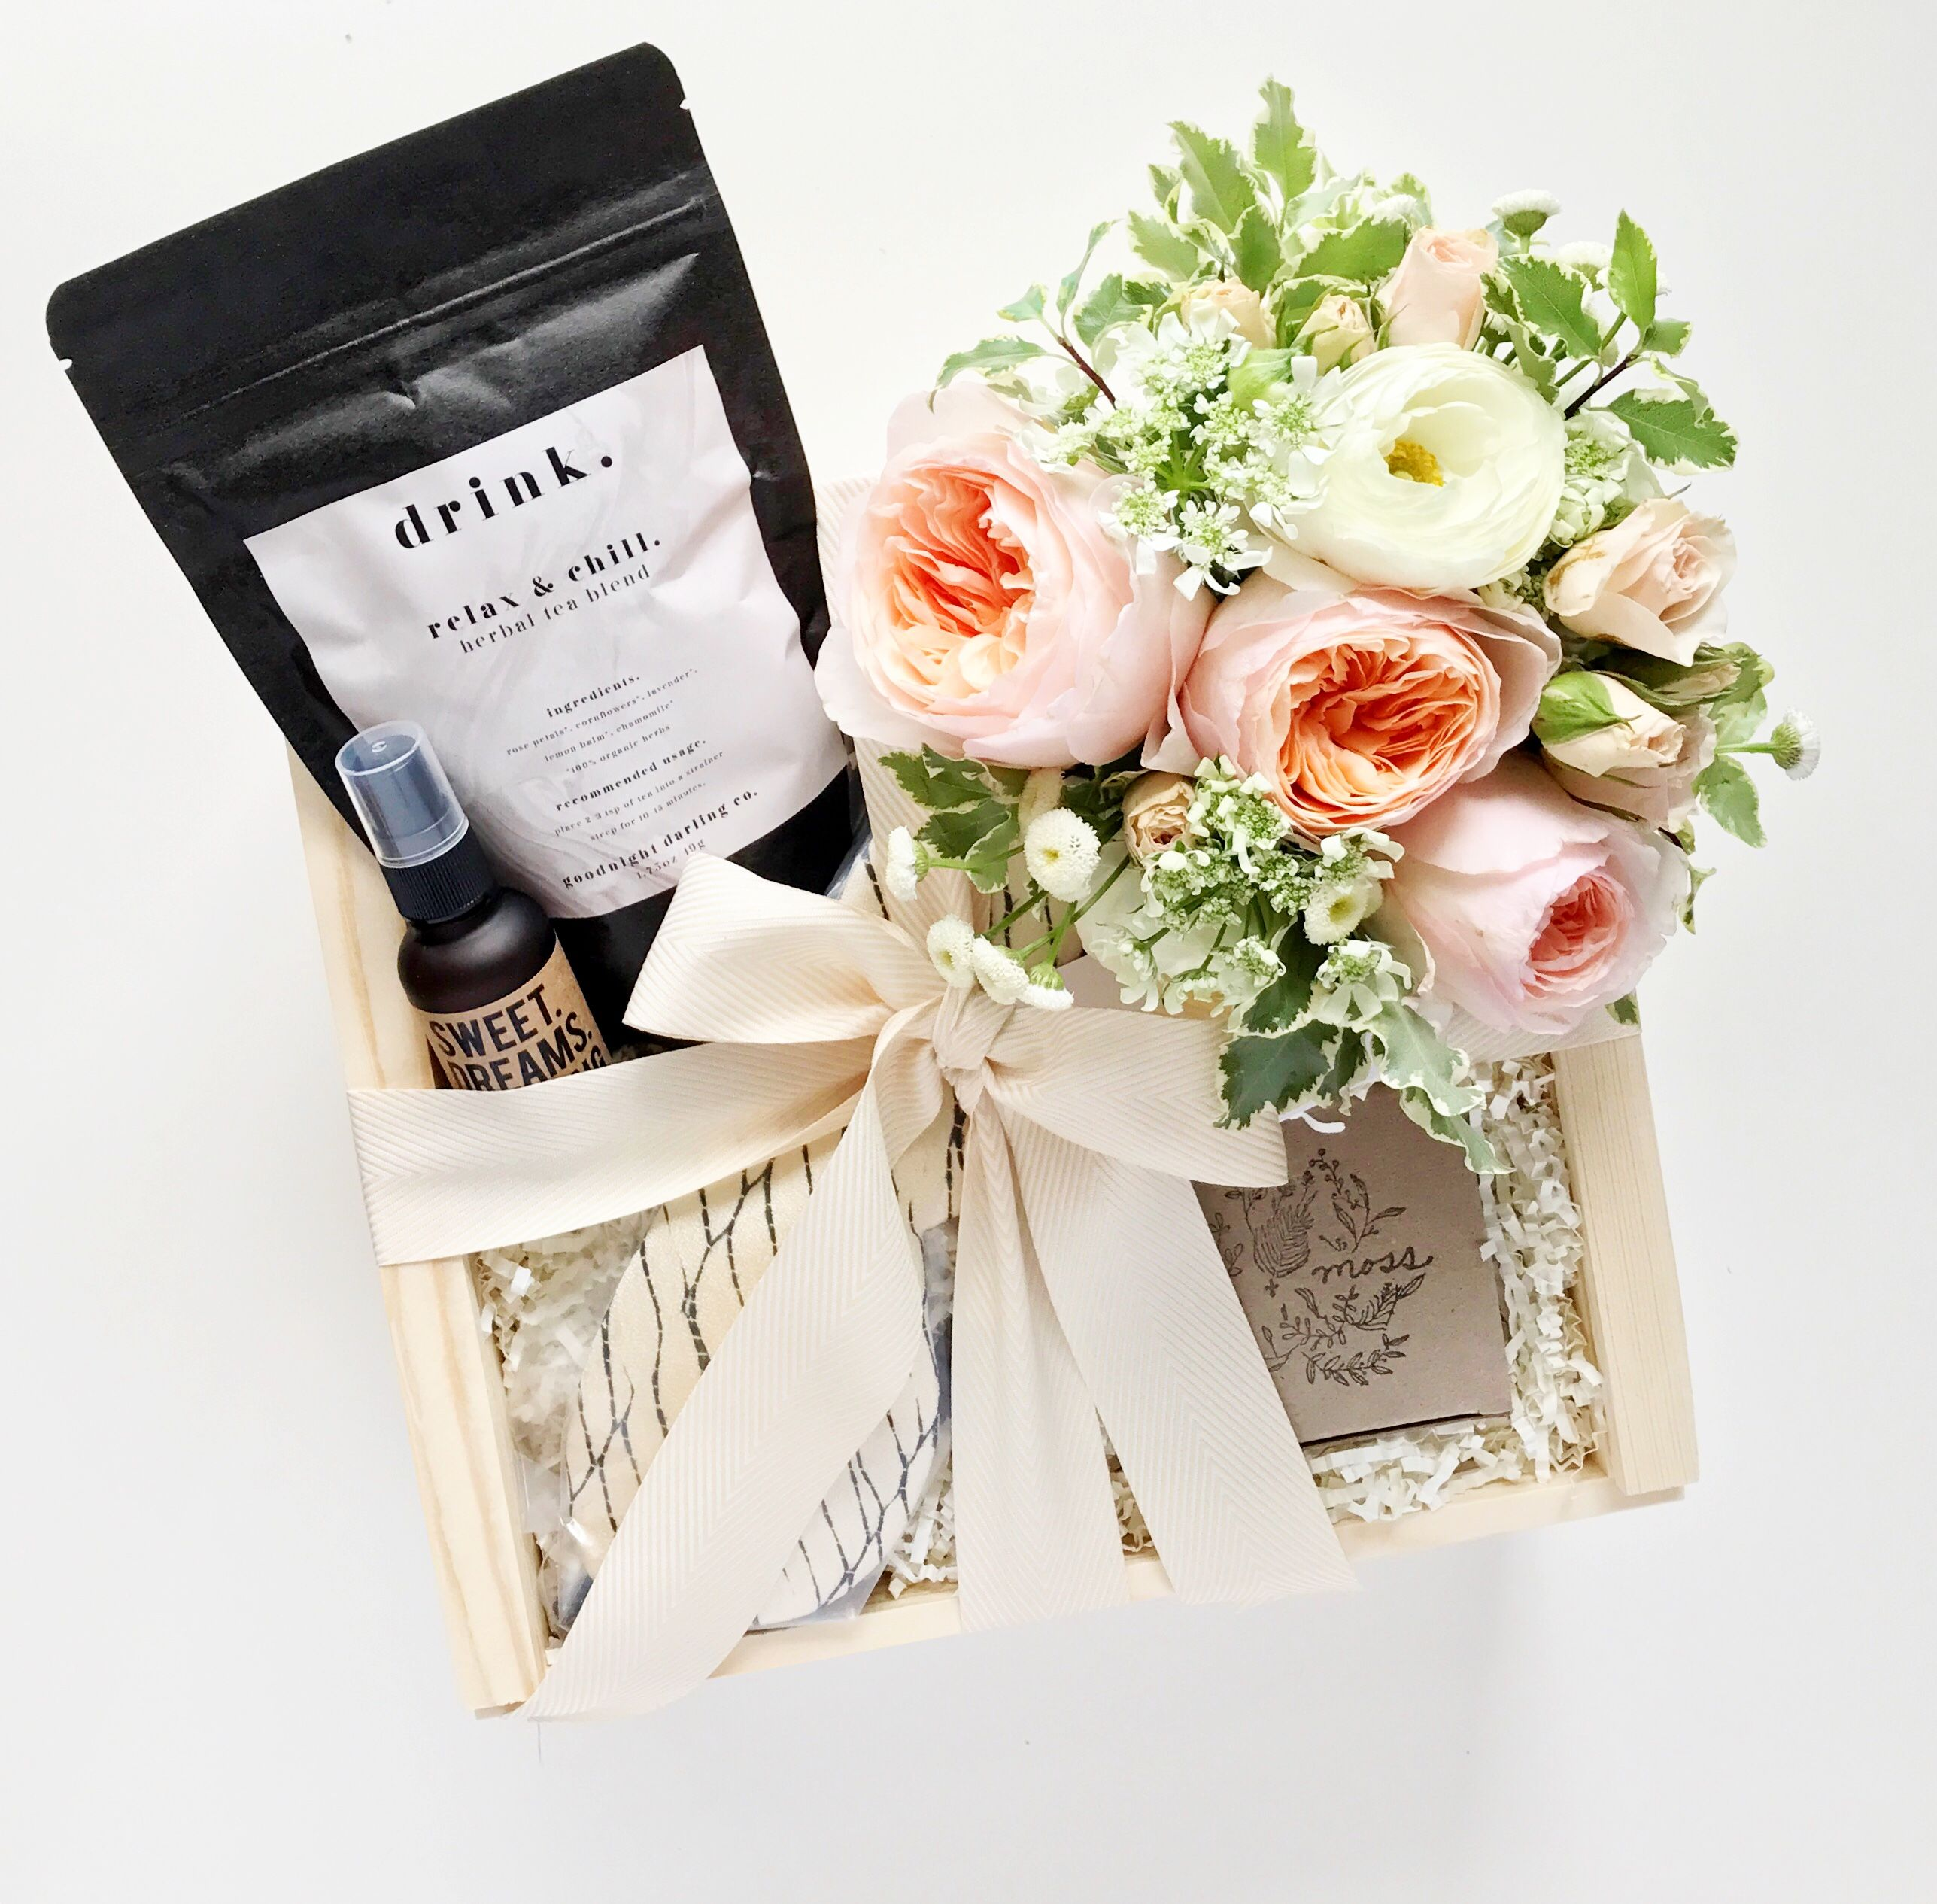 Gift box, floral inspo, wedding gifts, wedding ideas, motherhood ...